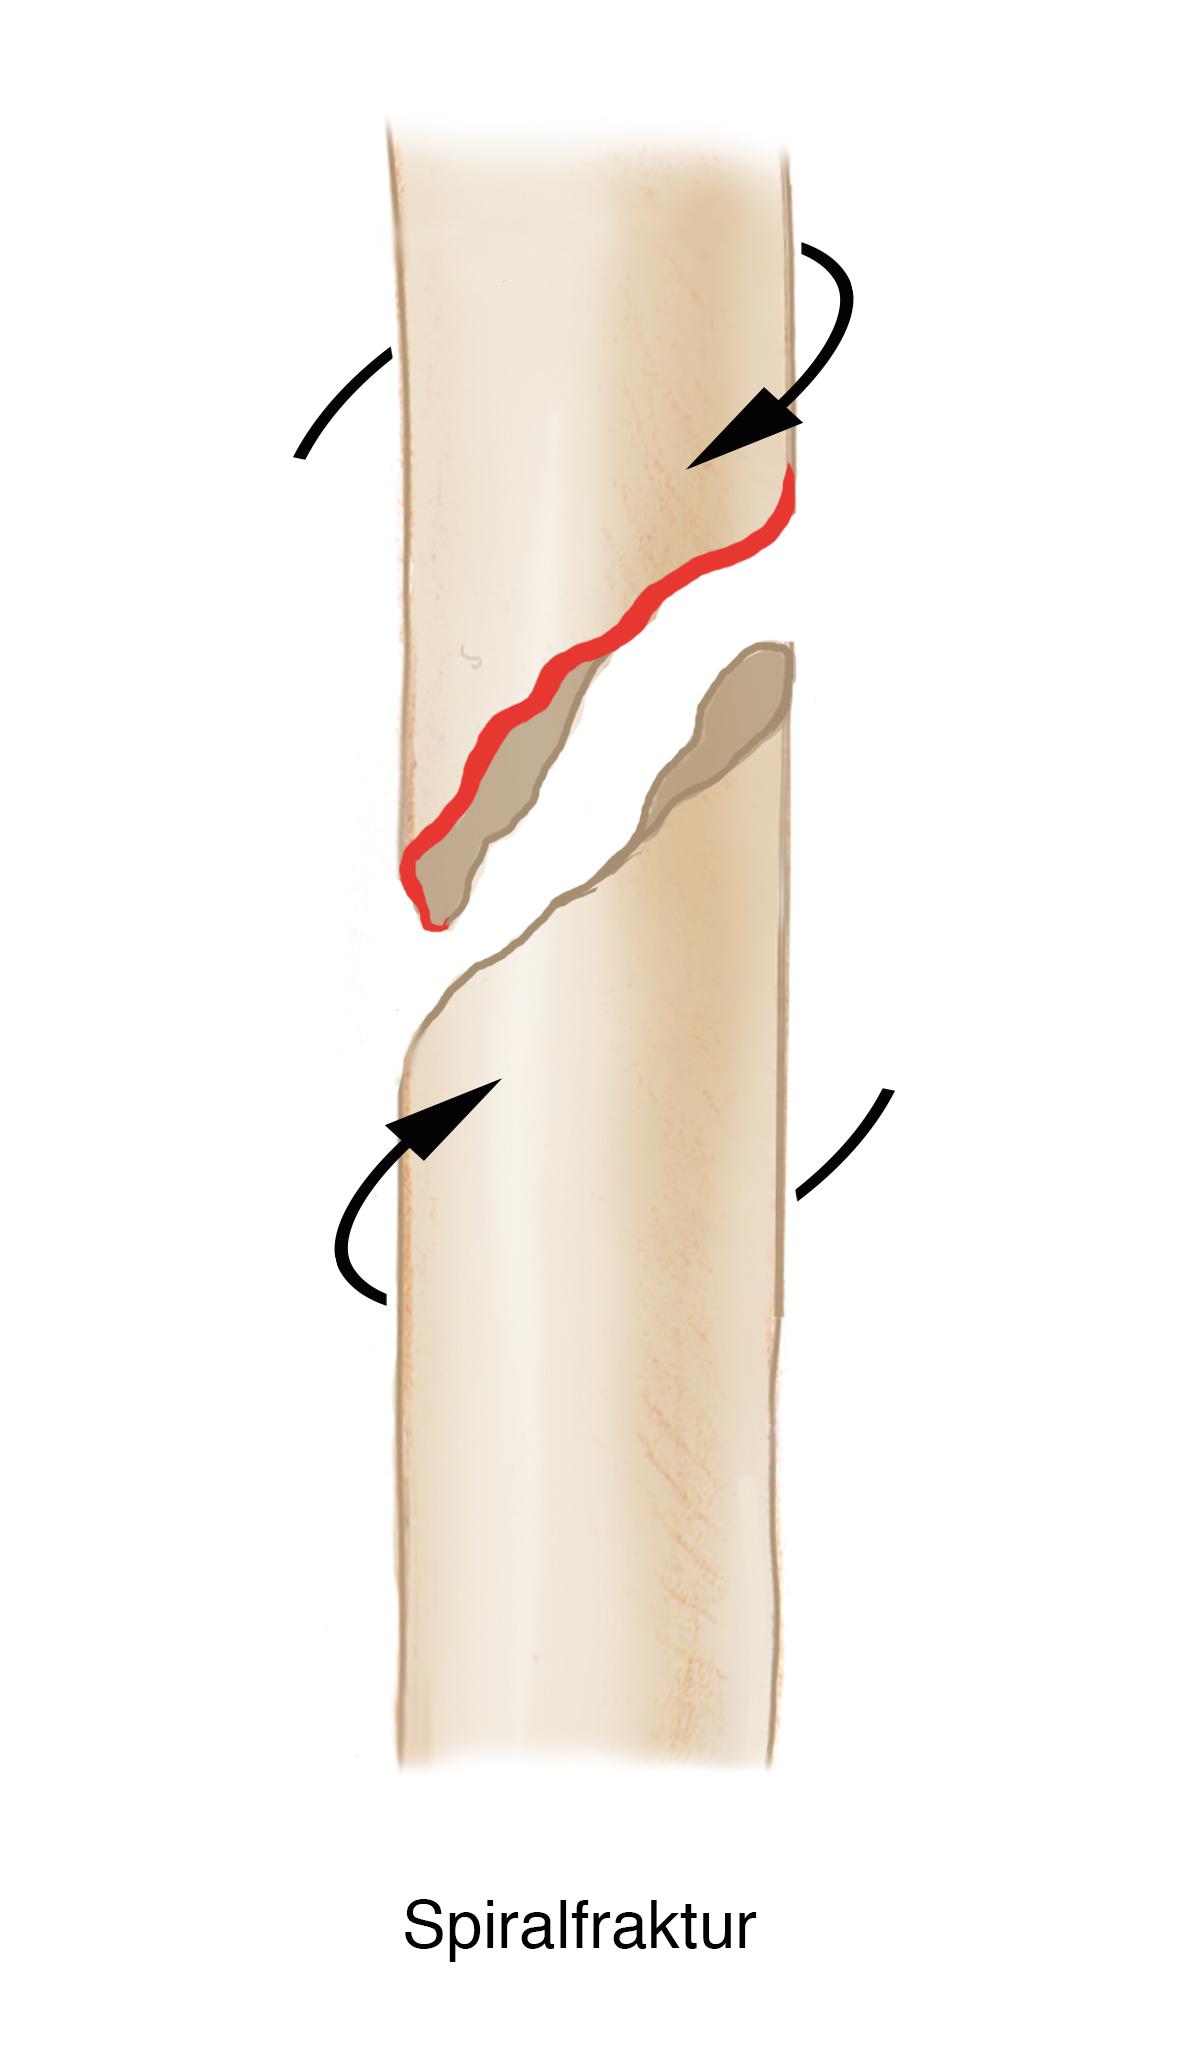 Spiralfraktur